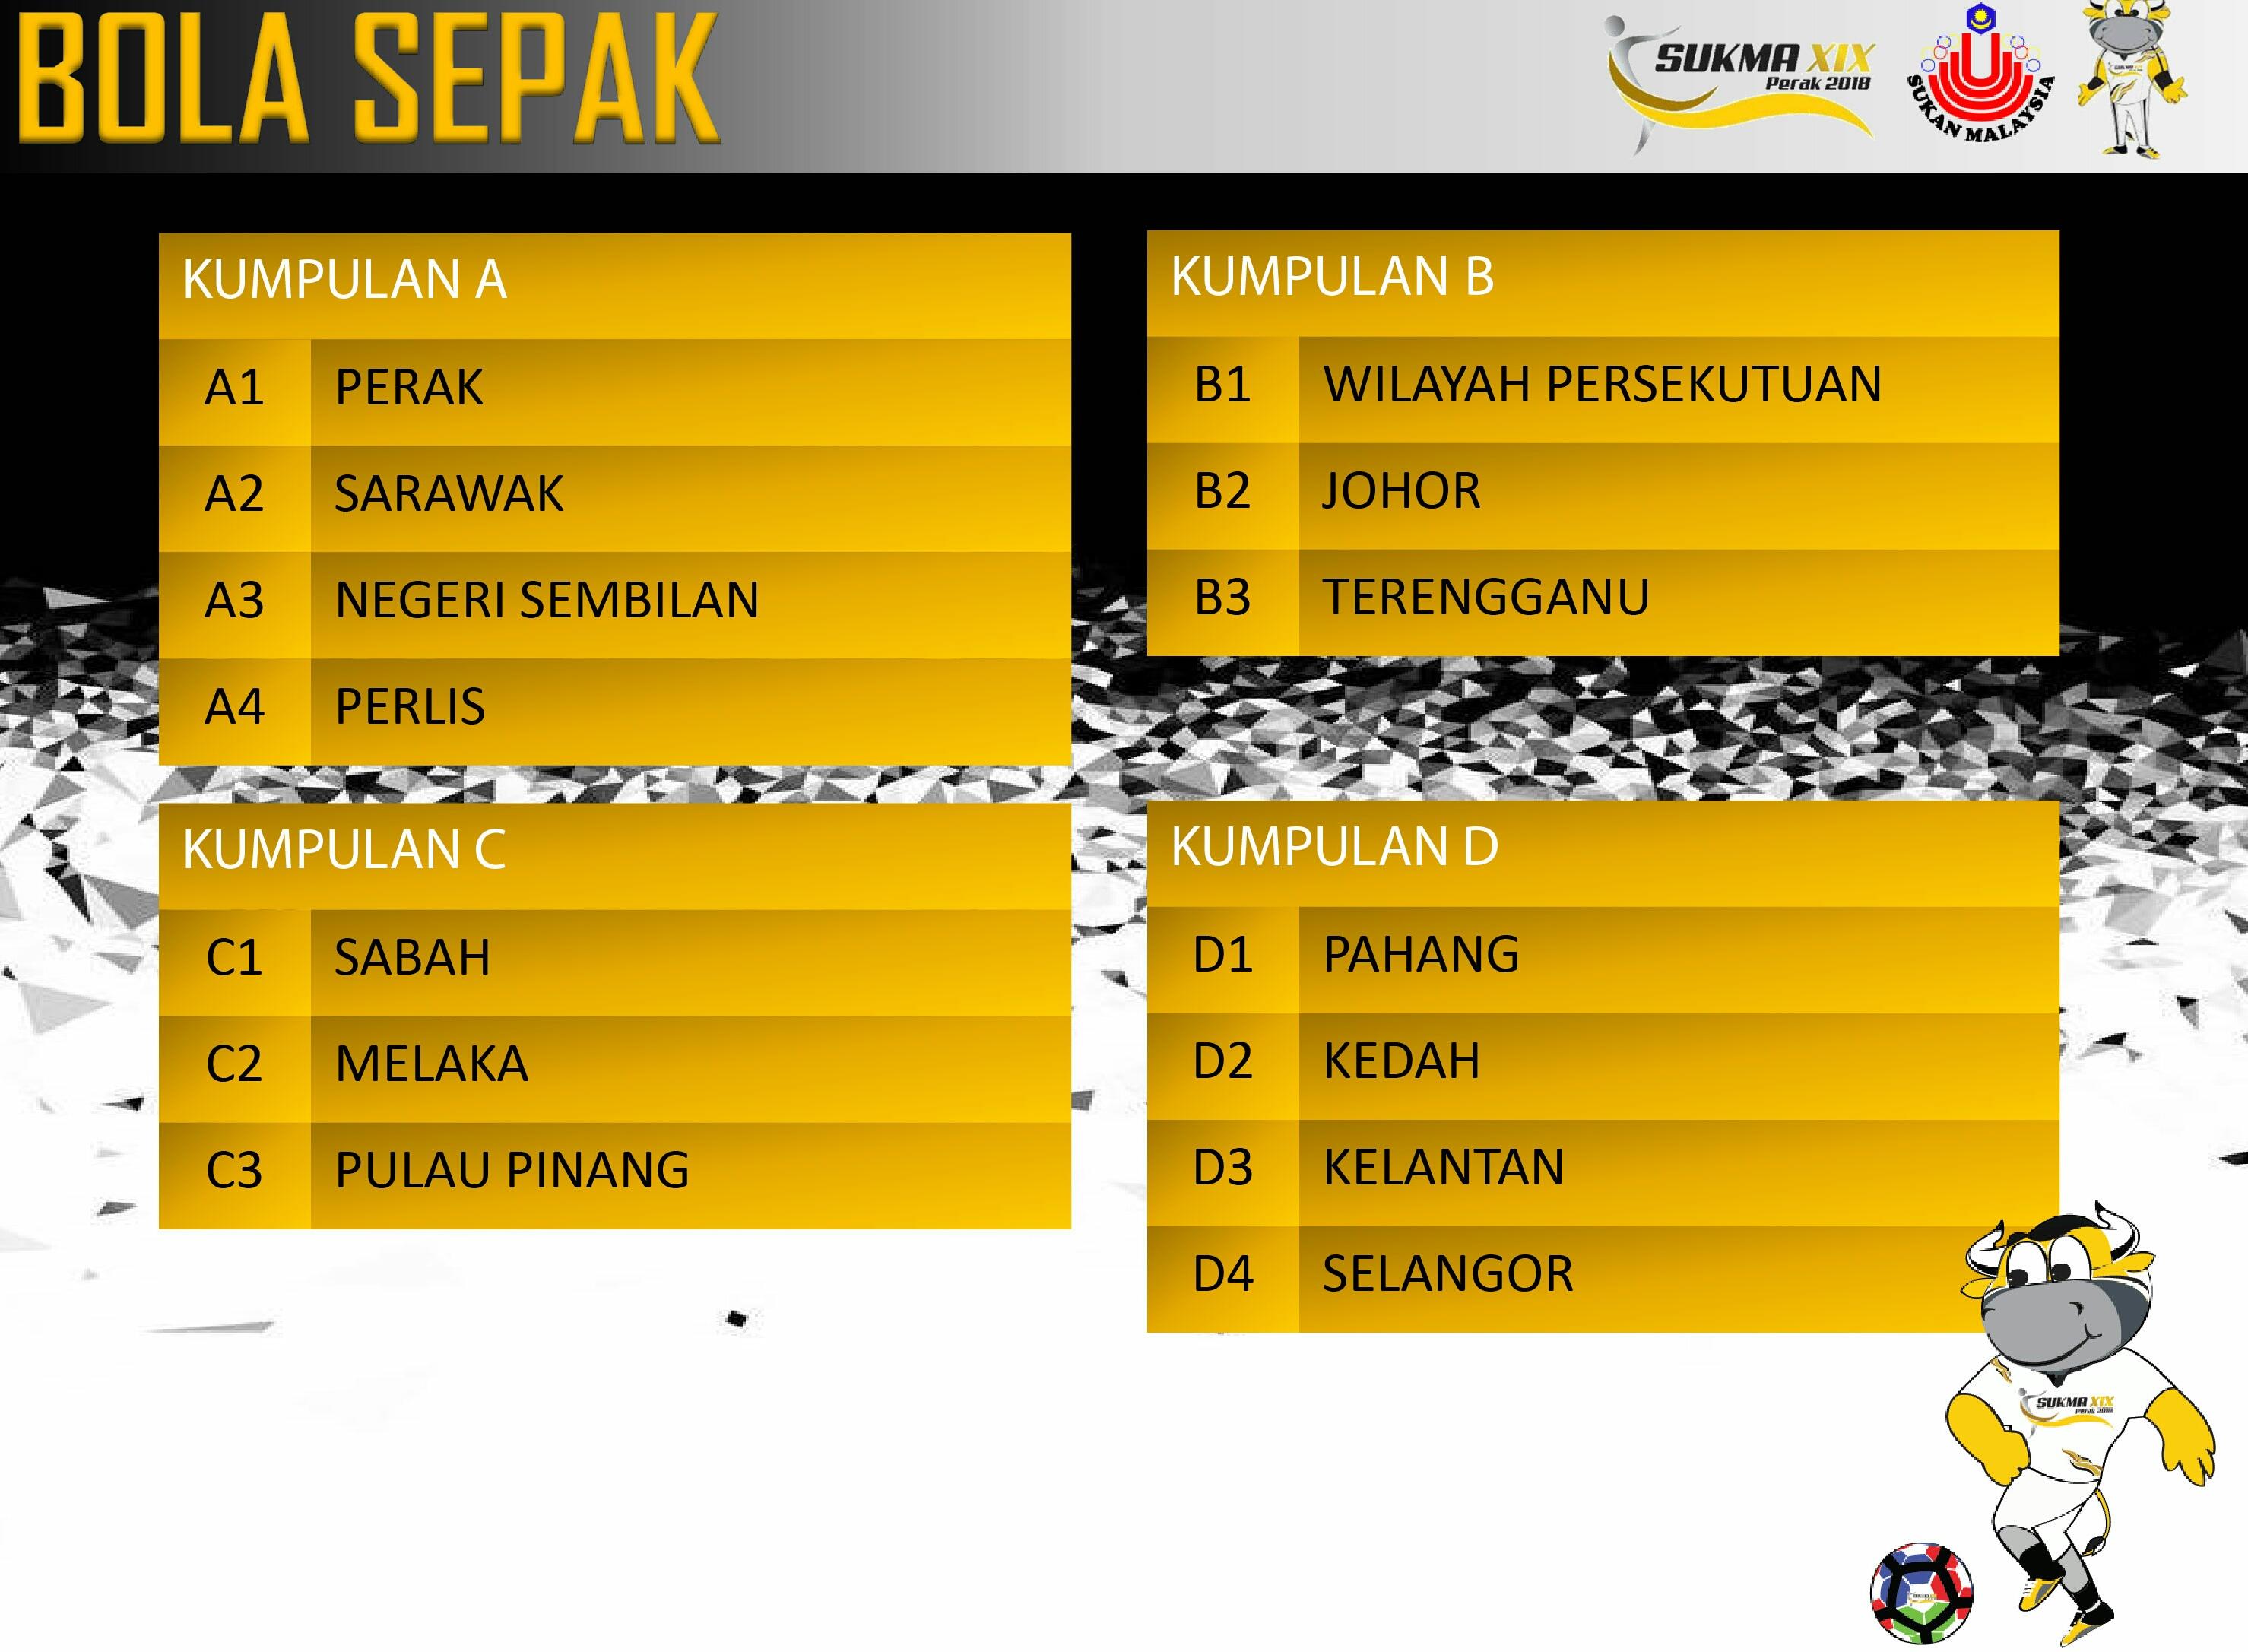 Jadual Bola Sepak SUKMA 2018 Perak